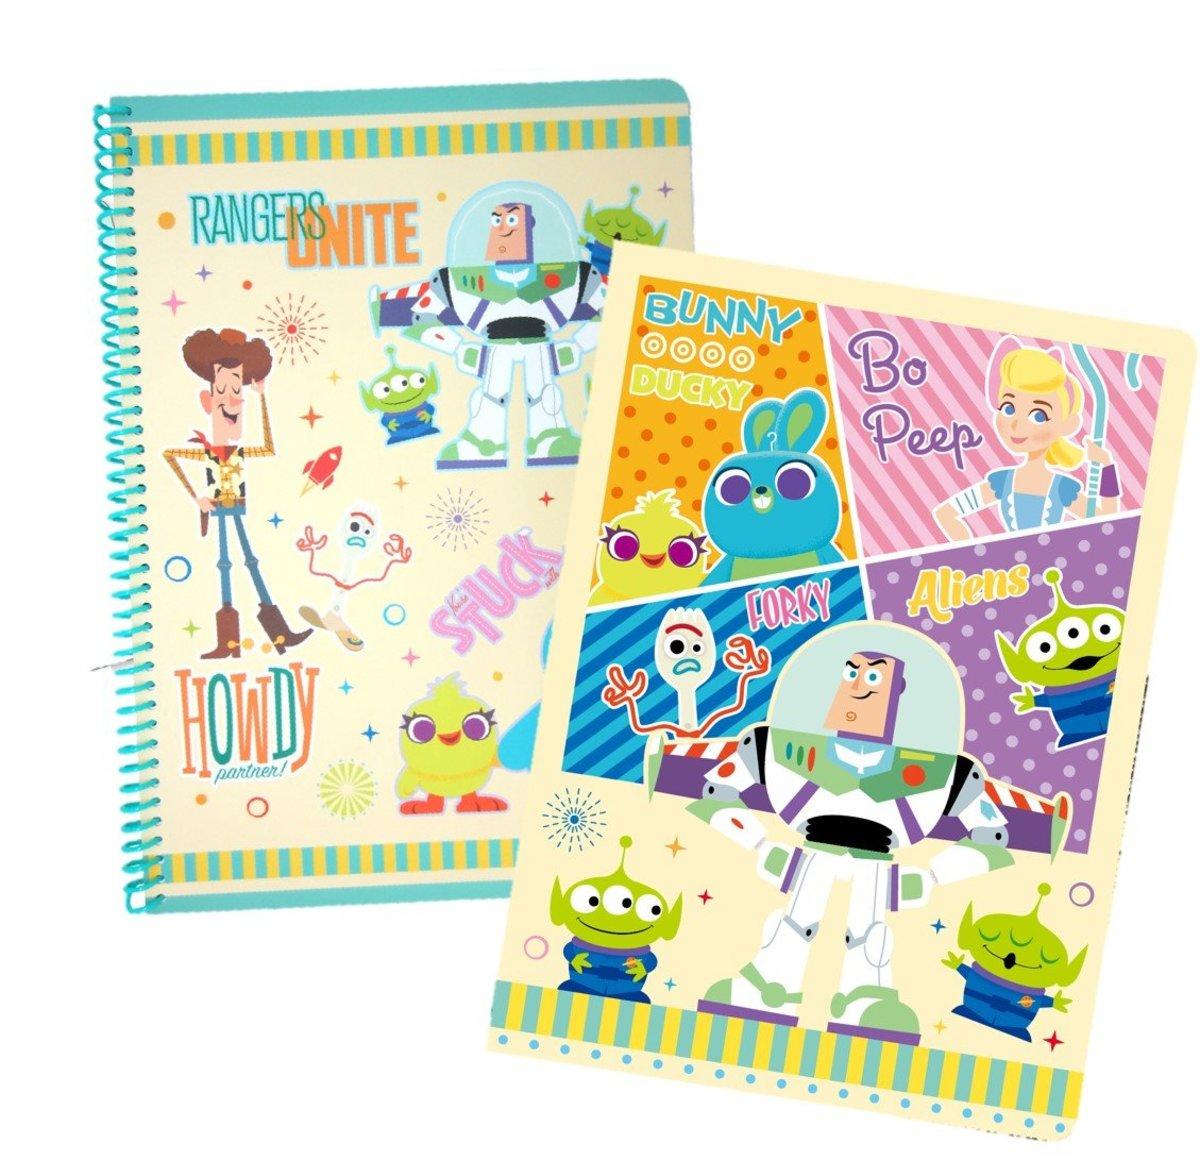 Disney迪士尼 --Notebook Set (Licensed by Disney)